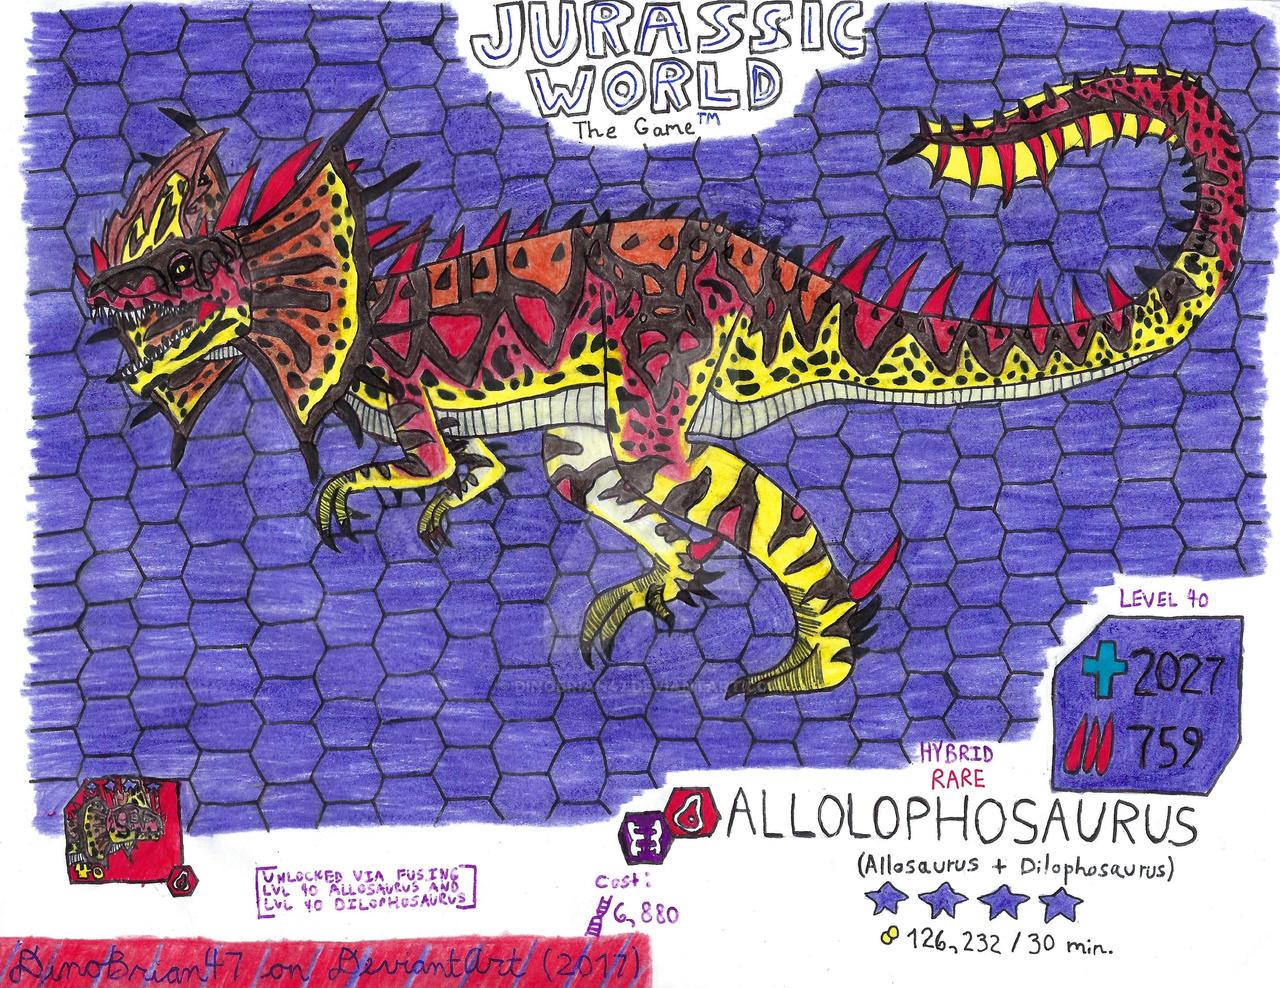 jurassic world the game  allolophosaurusdinobrian47